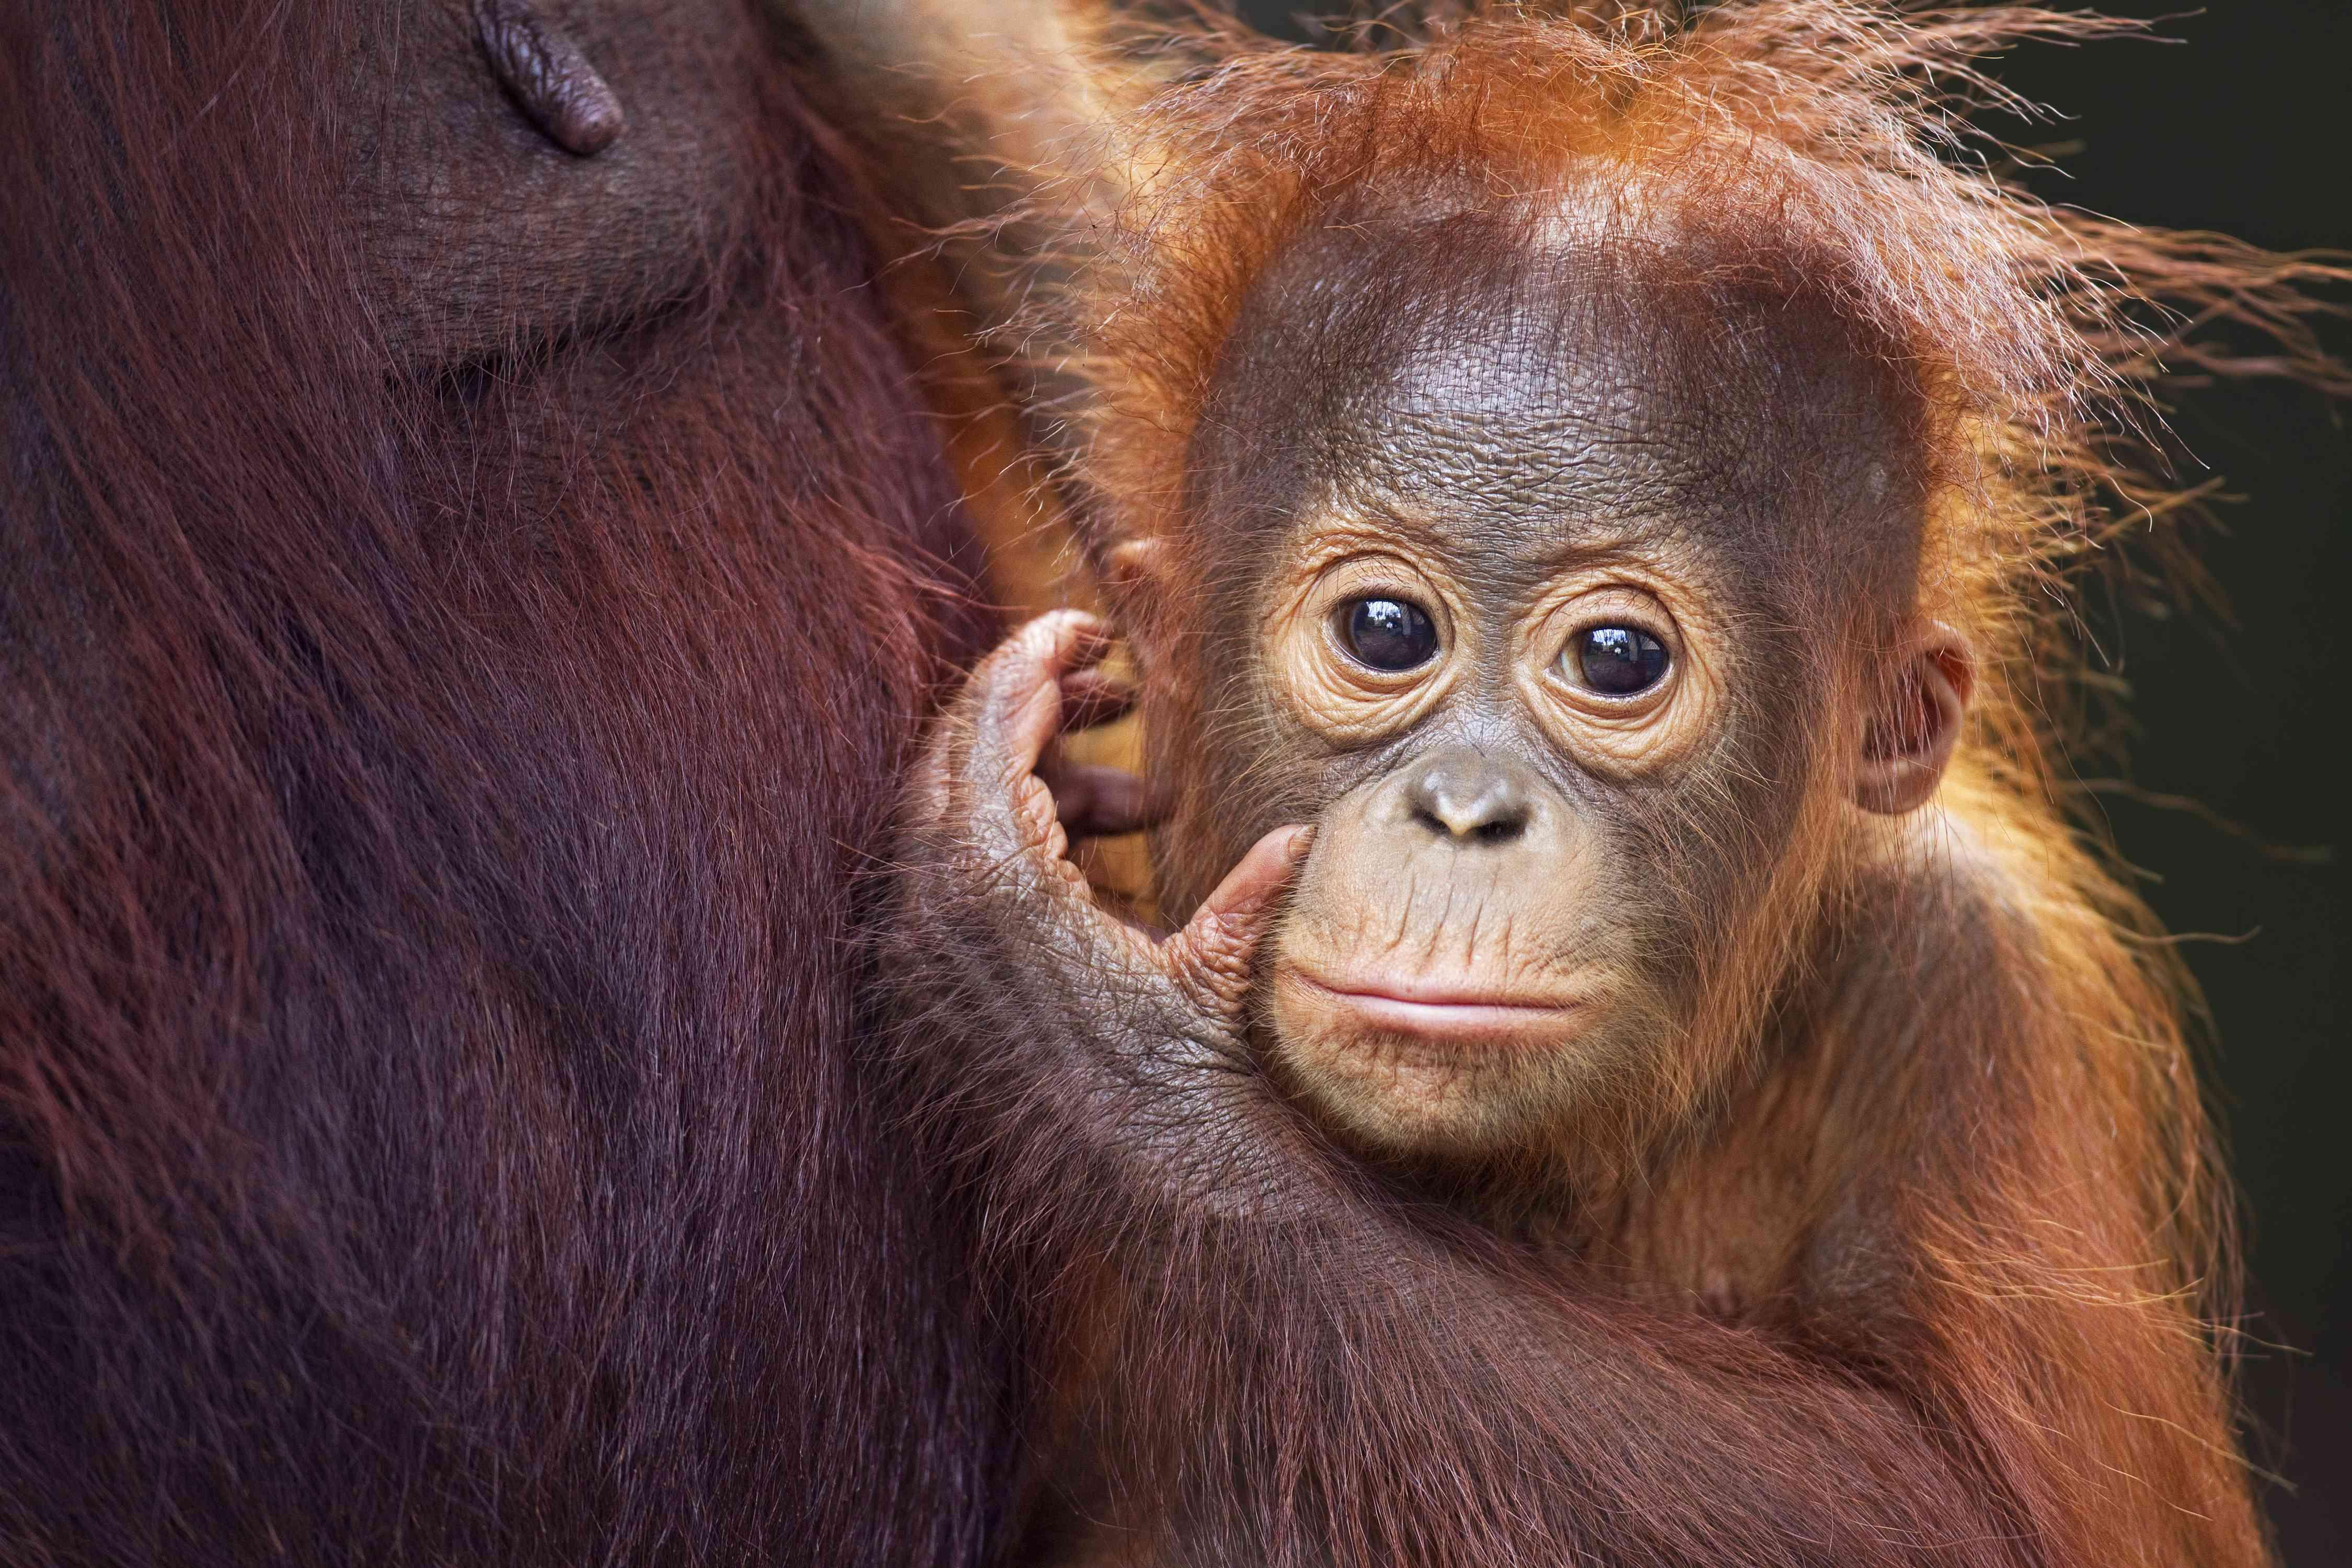 A baby orangutan in Kalimantan, Borneo